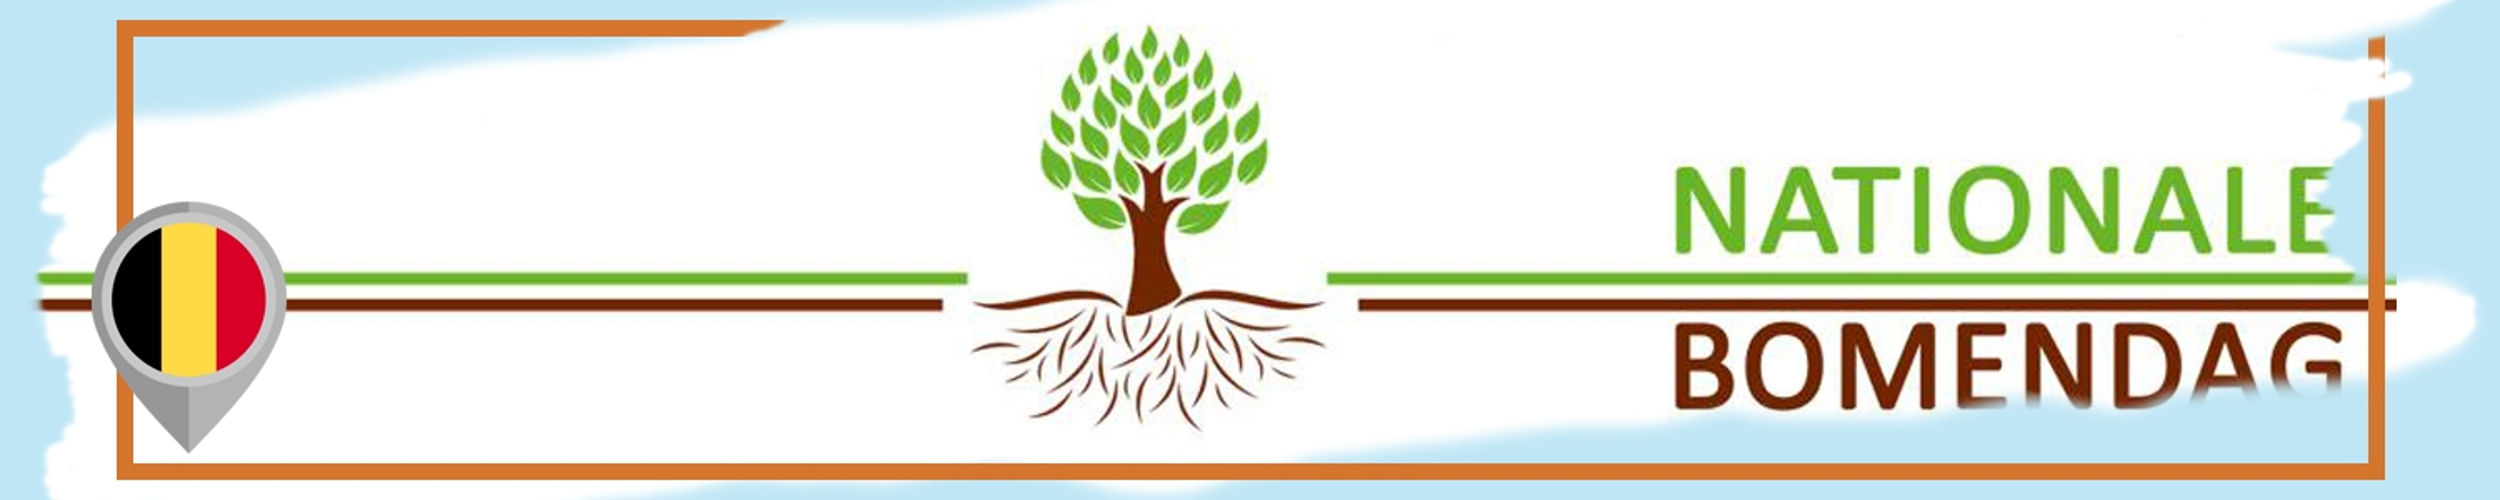 Uitnodiging 4de editie Nationale Bomendag